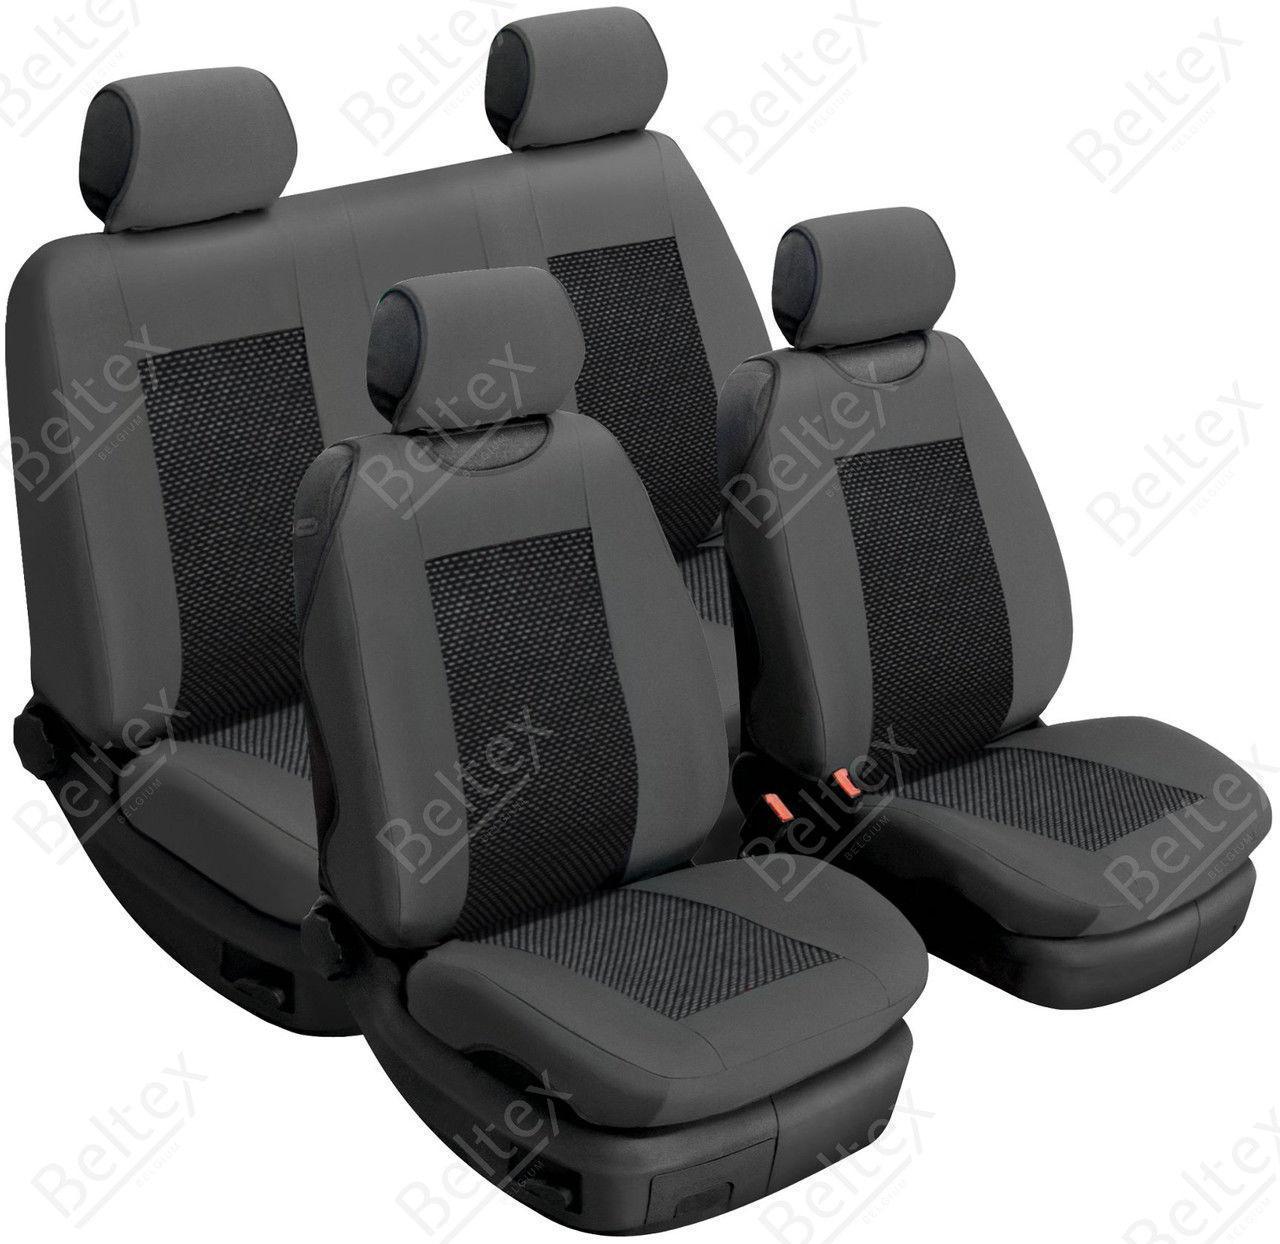 Майки/чехлы на сиденья Акура РЛ (Acura RL)